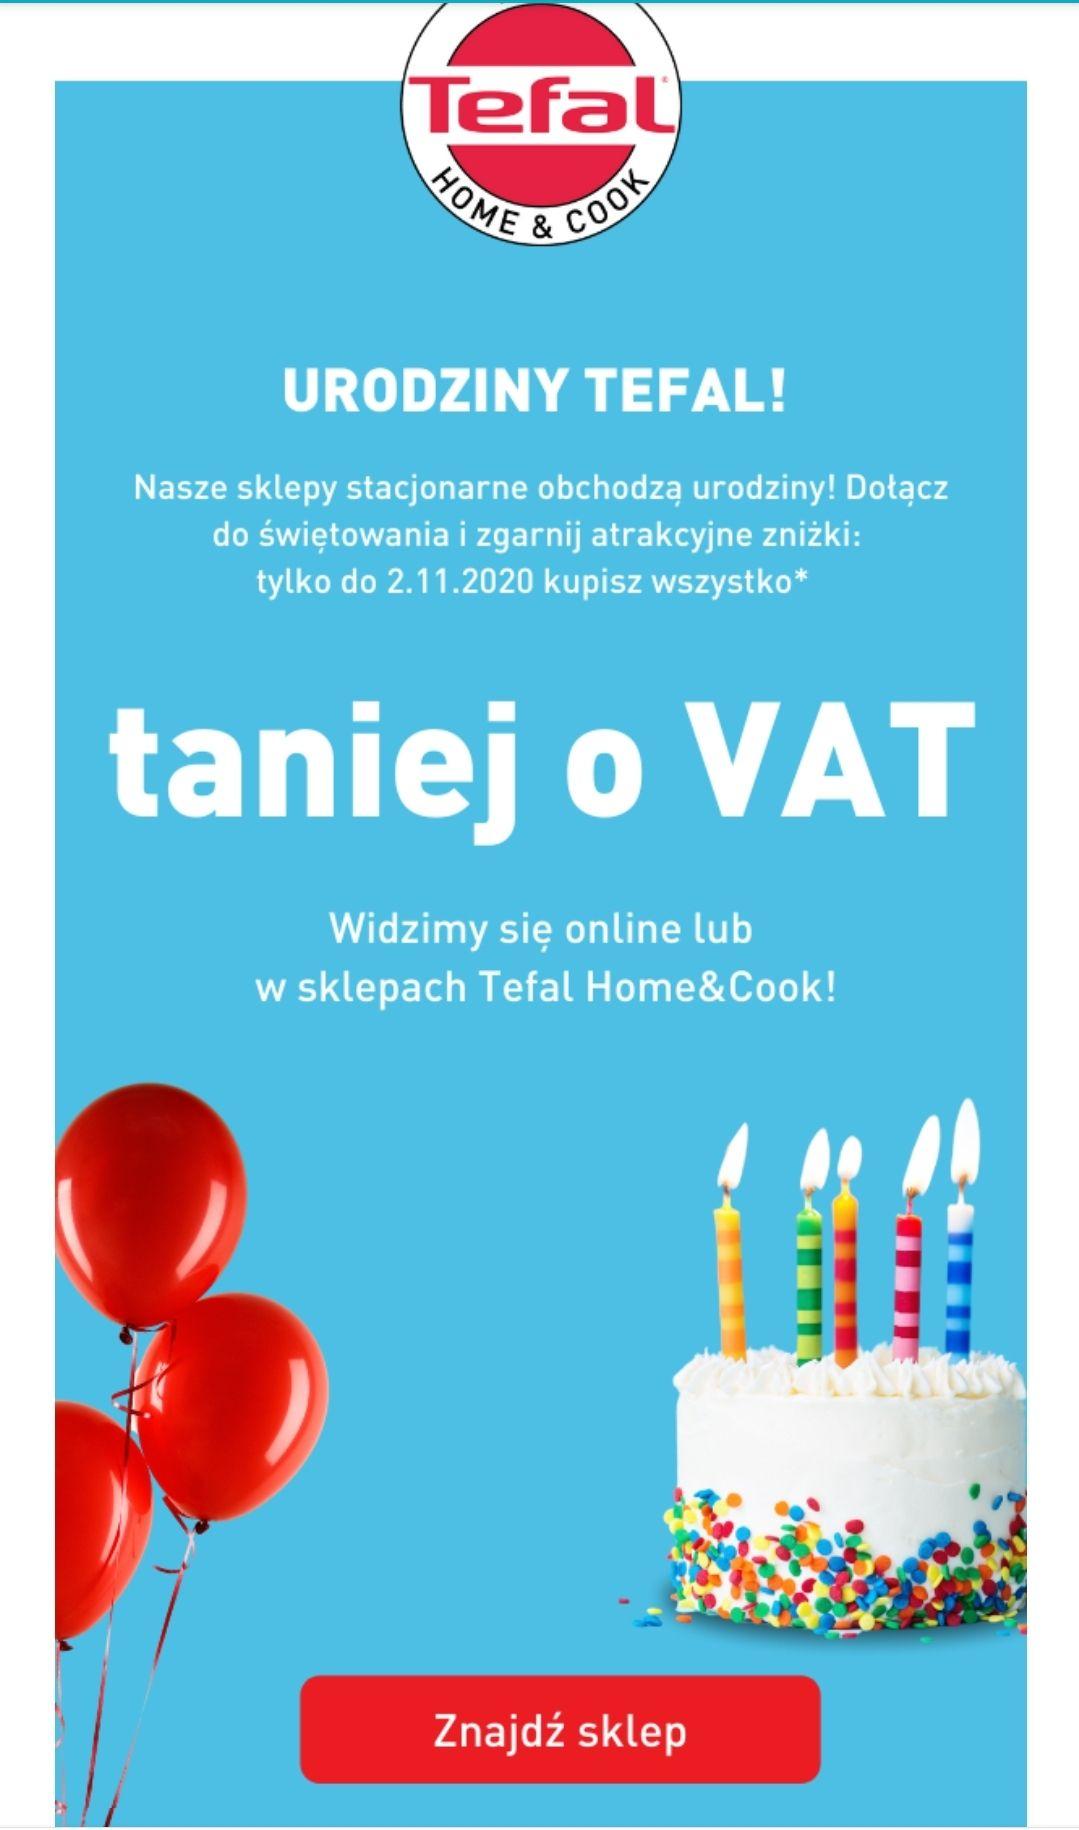 Od 20.10.2020 w sklepach stacjonarnych Home&Cook i online tefal taniej o VAT